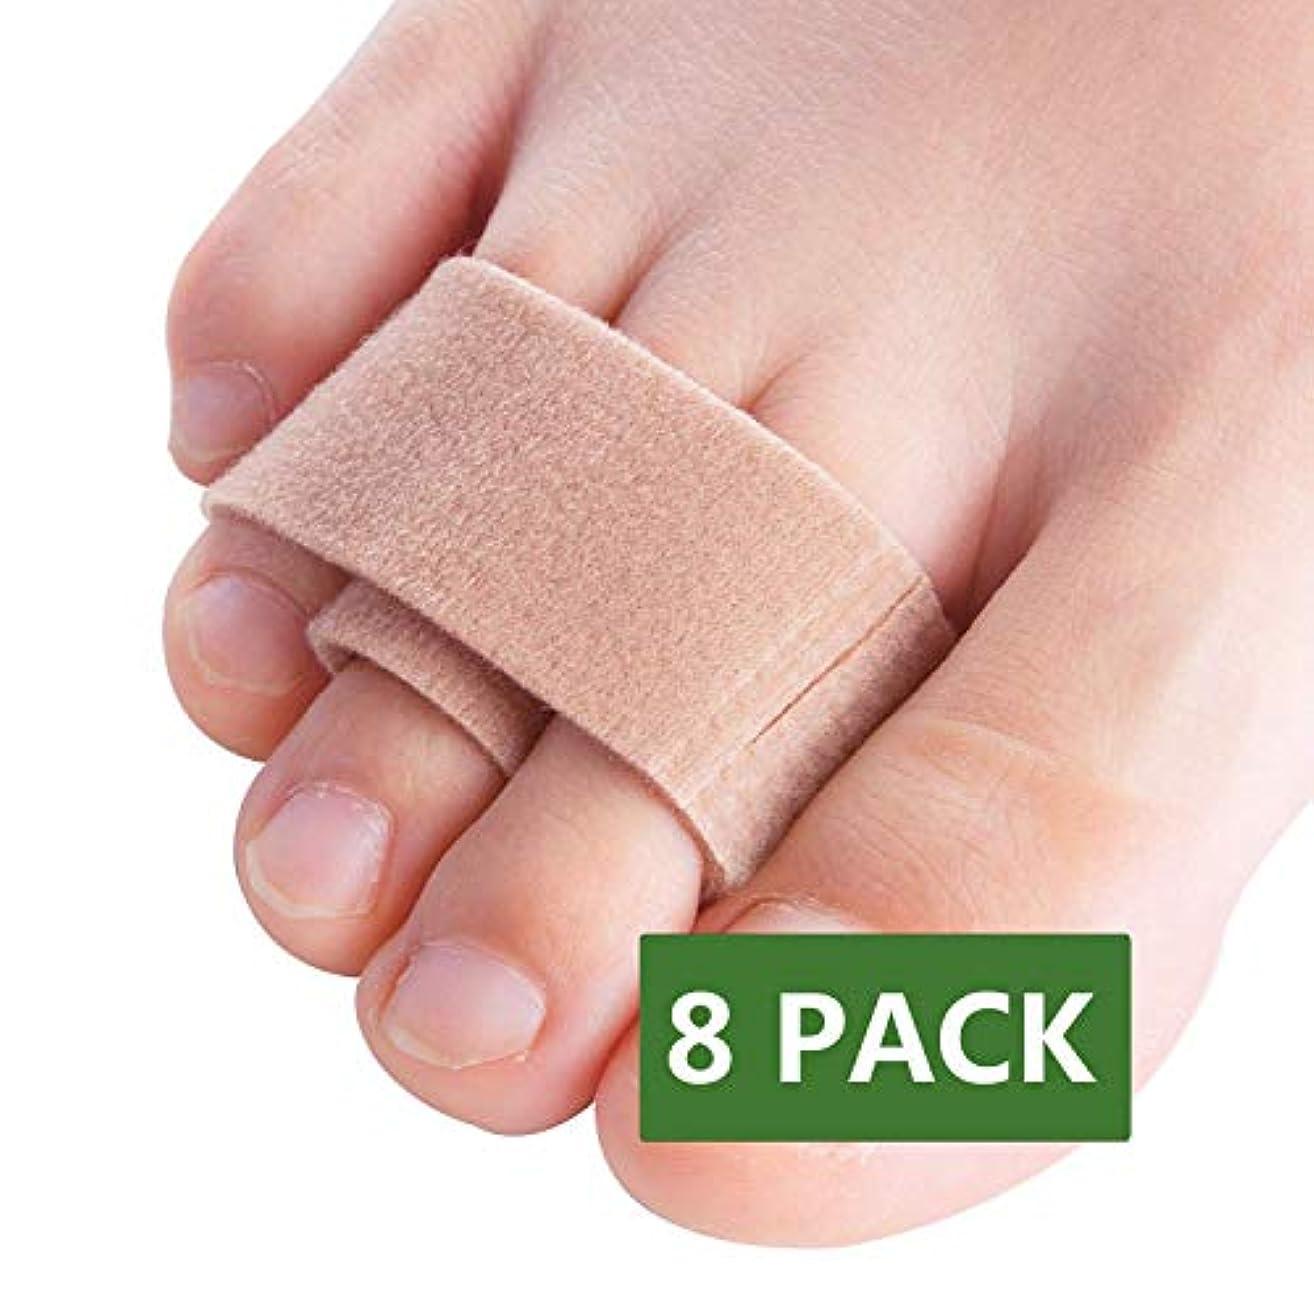 Povihome ハンマーつま先矯正テープ、つま先がスプリントを包んでハンマーのつま先を再調整8パック、重ねた足の指と曲がった足の指